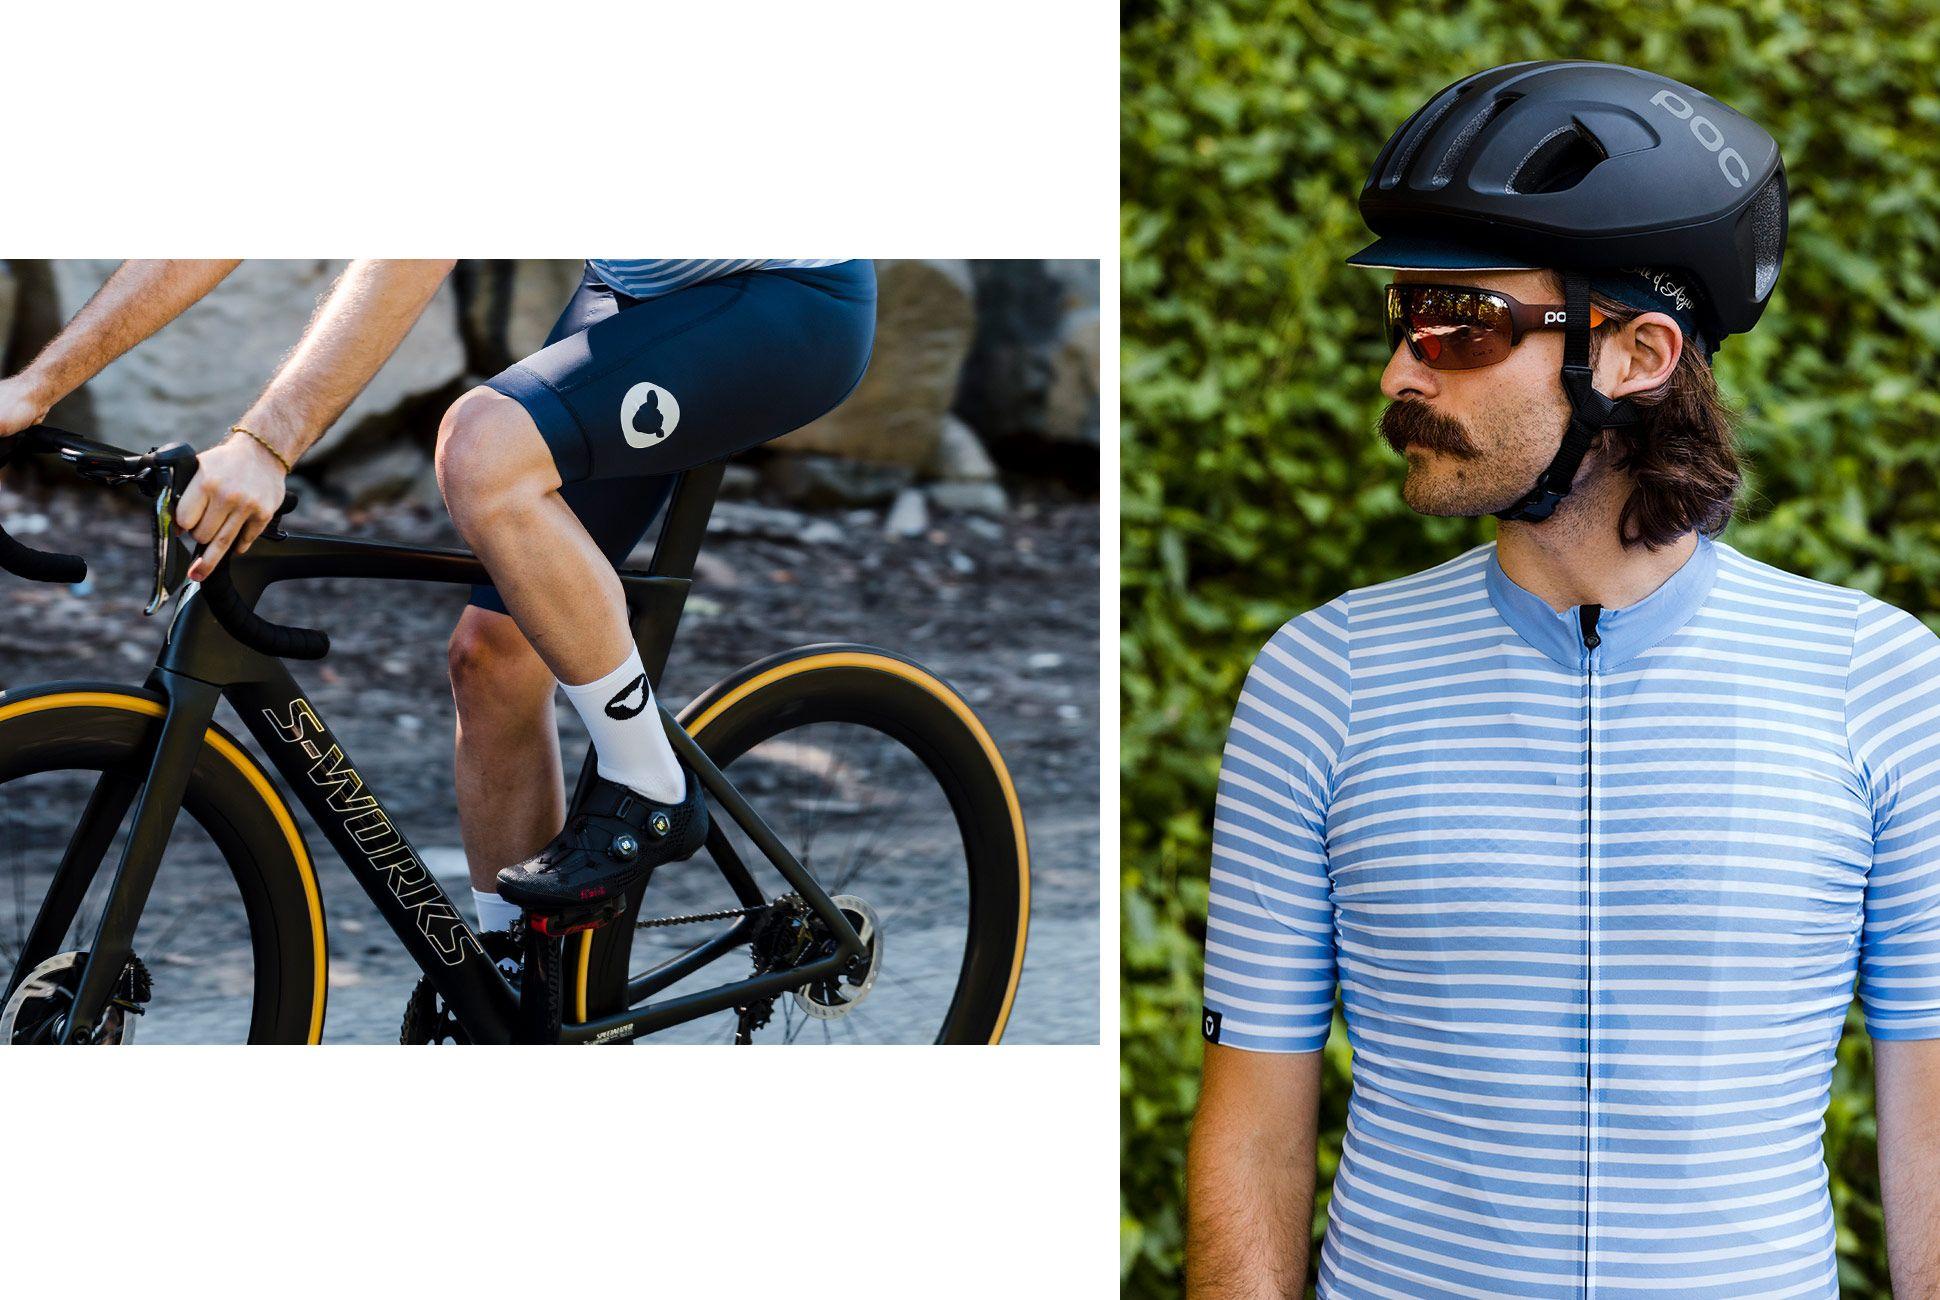 Summer-Cycling-Kits-2018-gear-patrol-ctb-slide-1